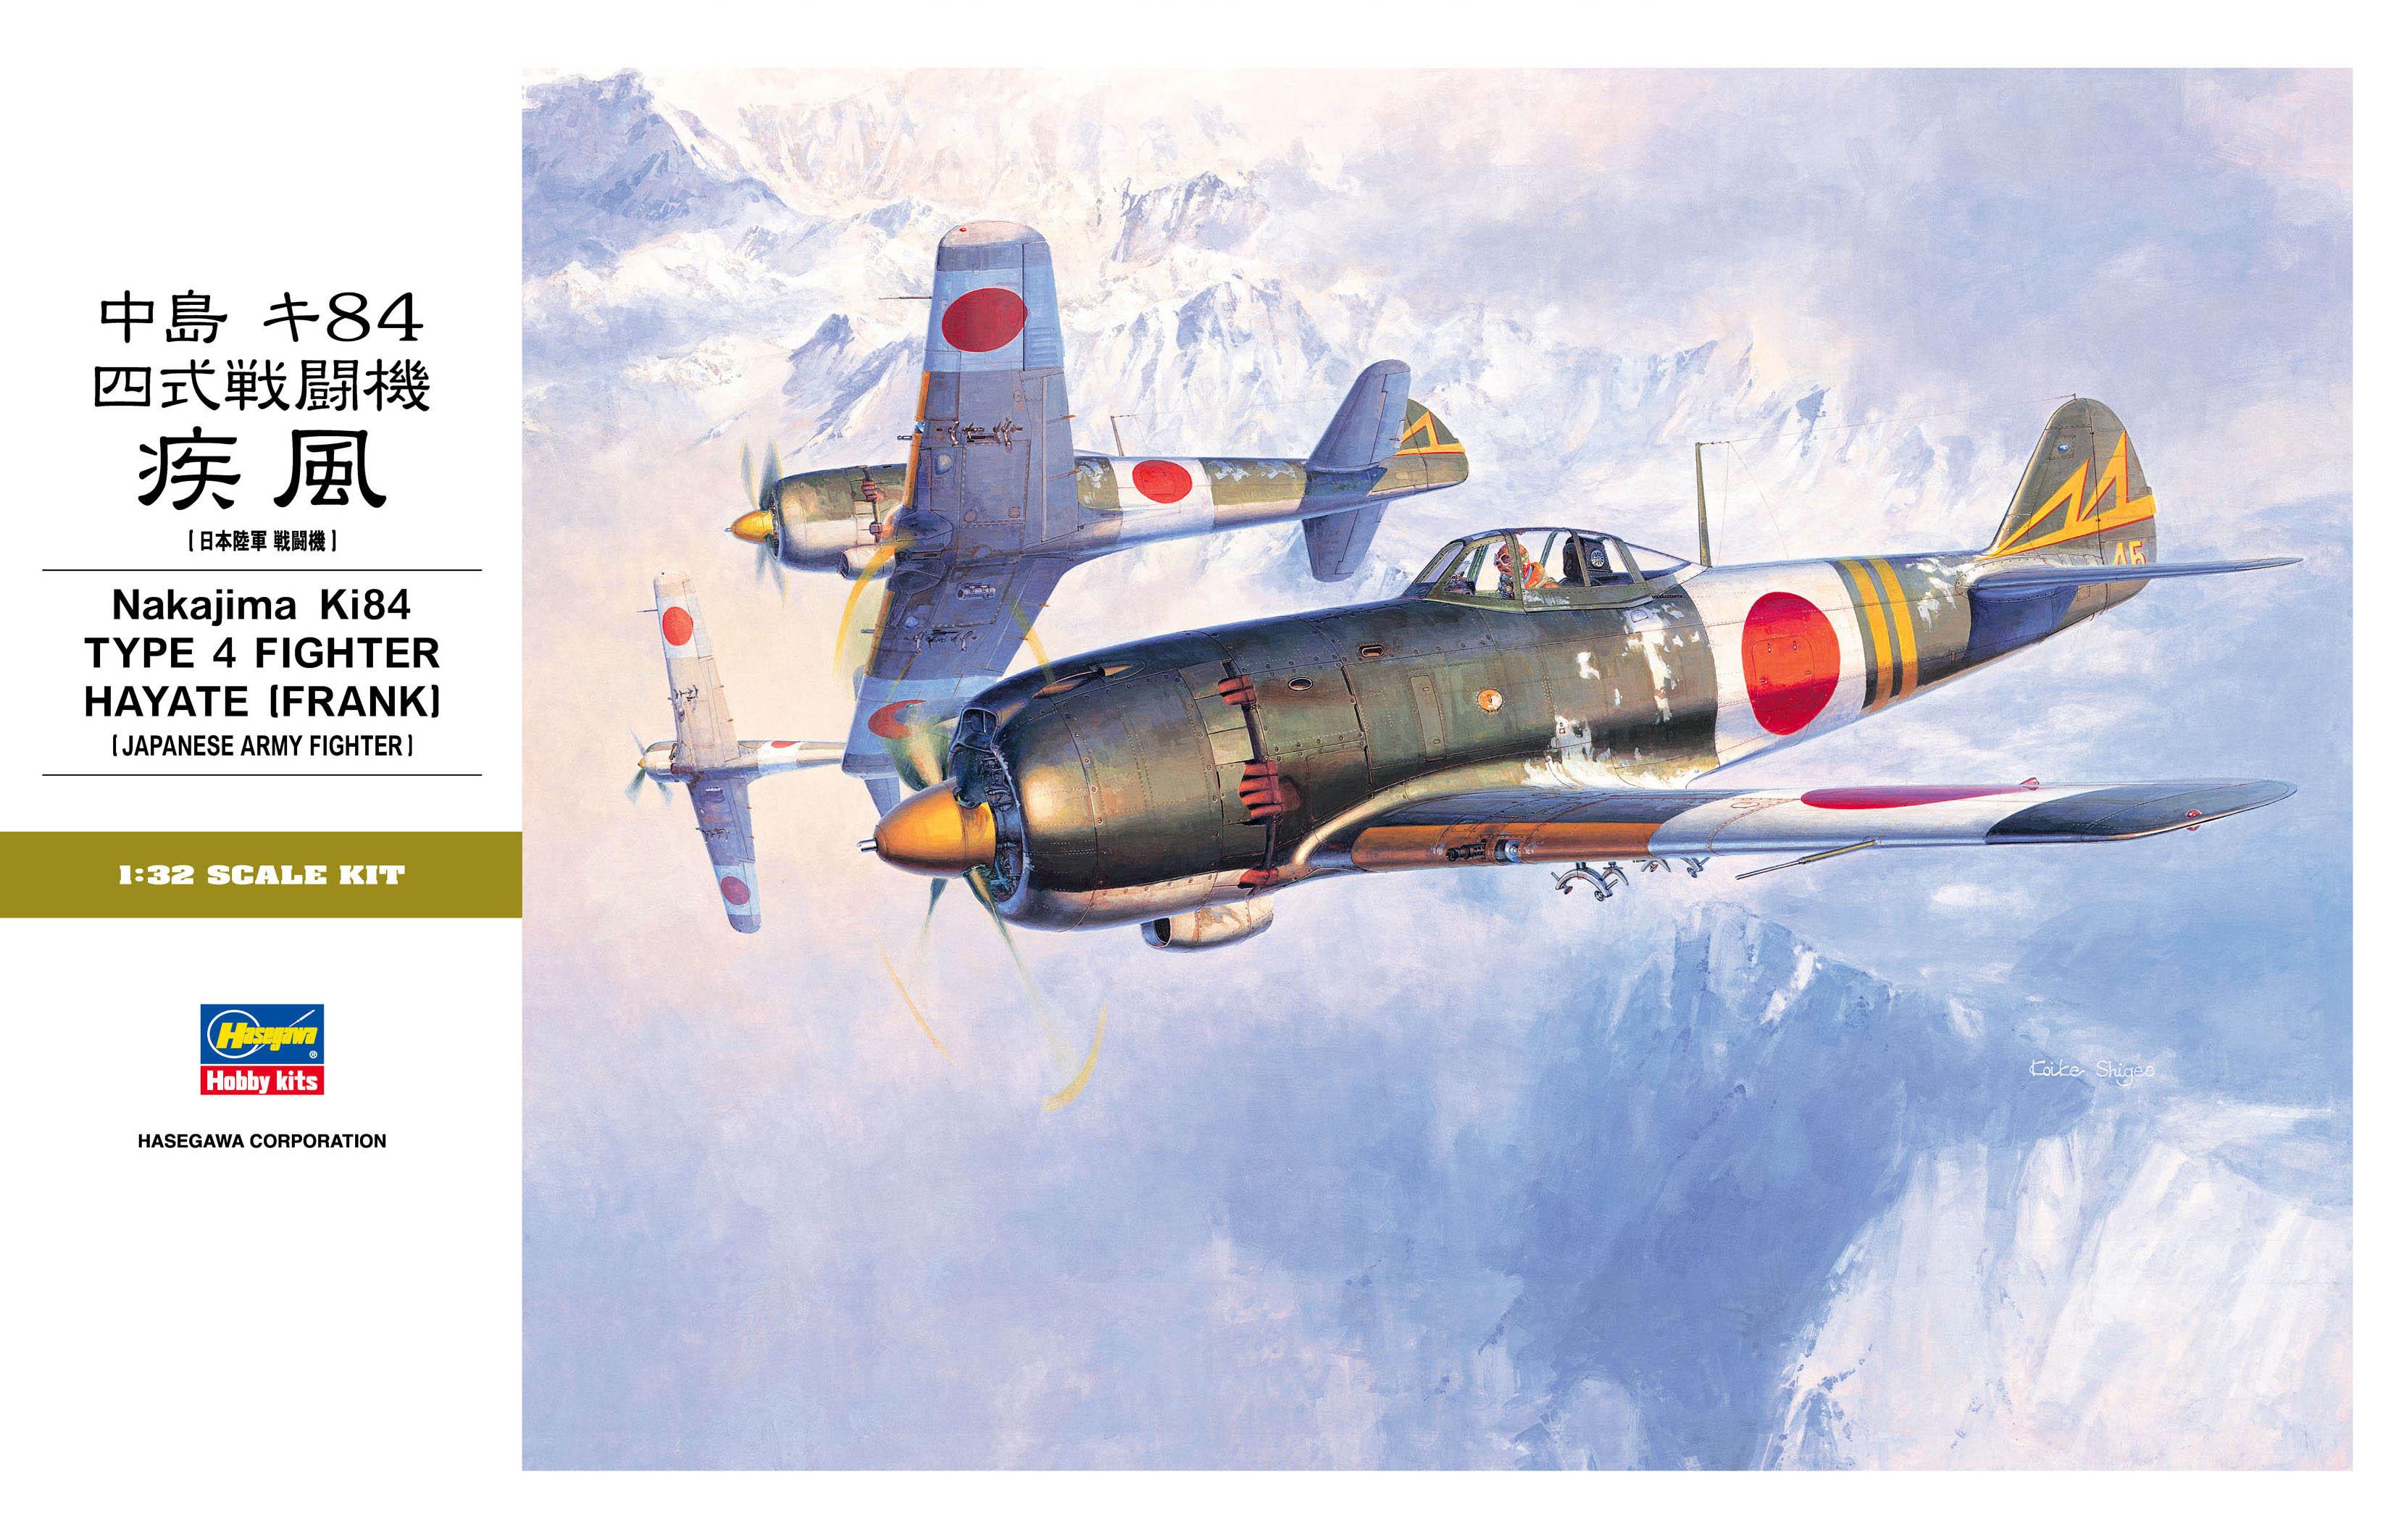 Hasegawa Nakajima Ki84 Type 4 Fighter Hayate (Frank)